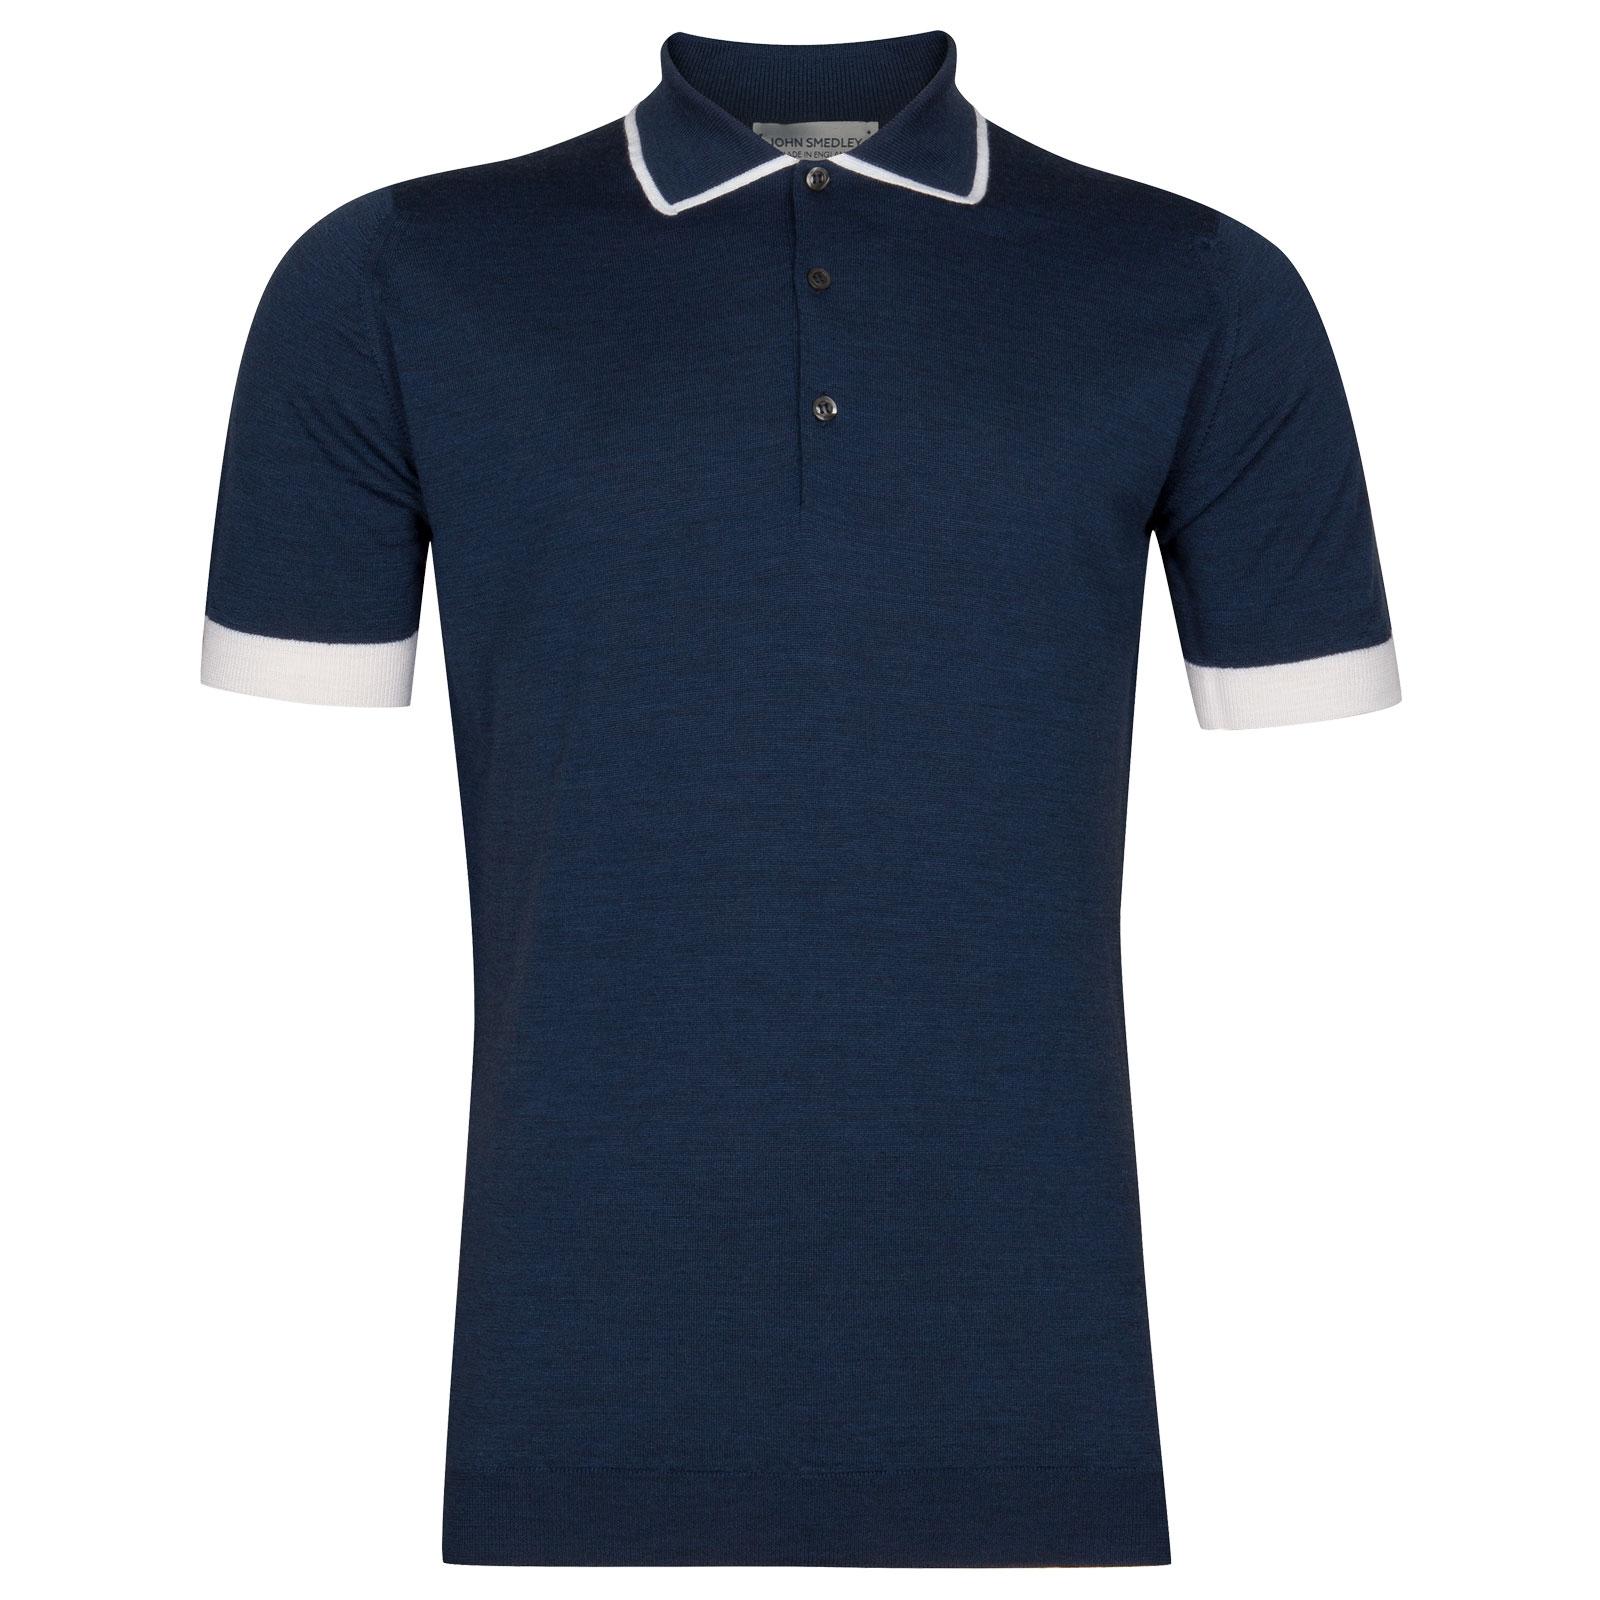 John Smedley Nailsea Extra Fine Merino Shirt in Indigo-M